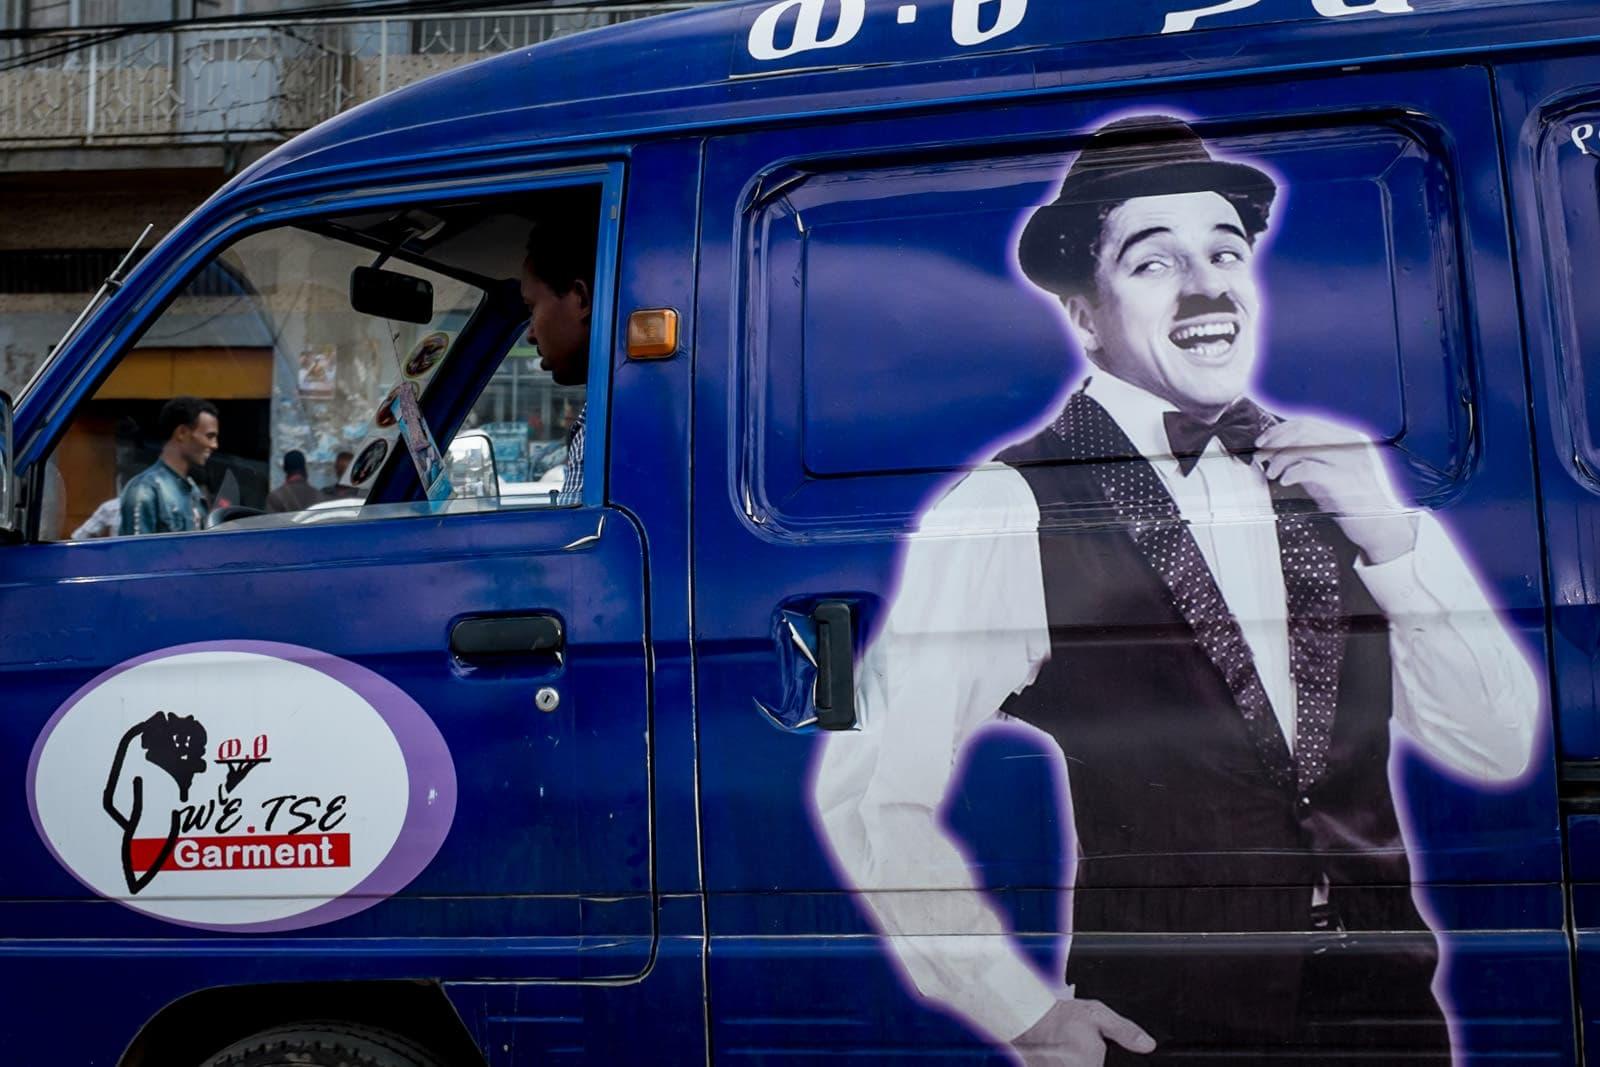 Charlie Chaplin on the side of a purple van in Addis Ababa, Ethiopia, Afriac